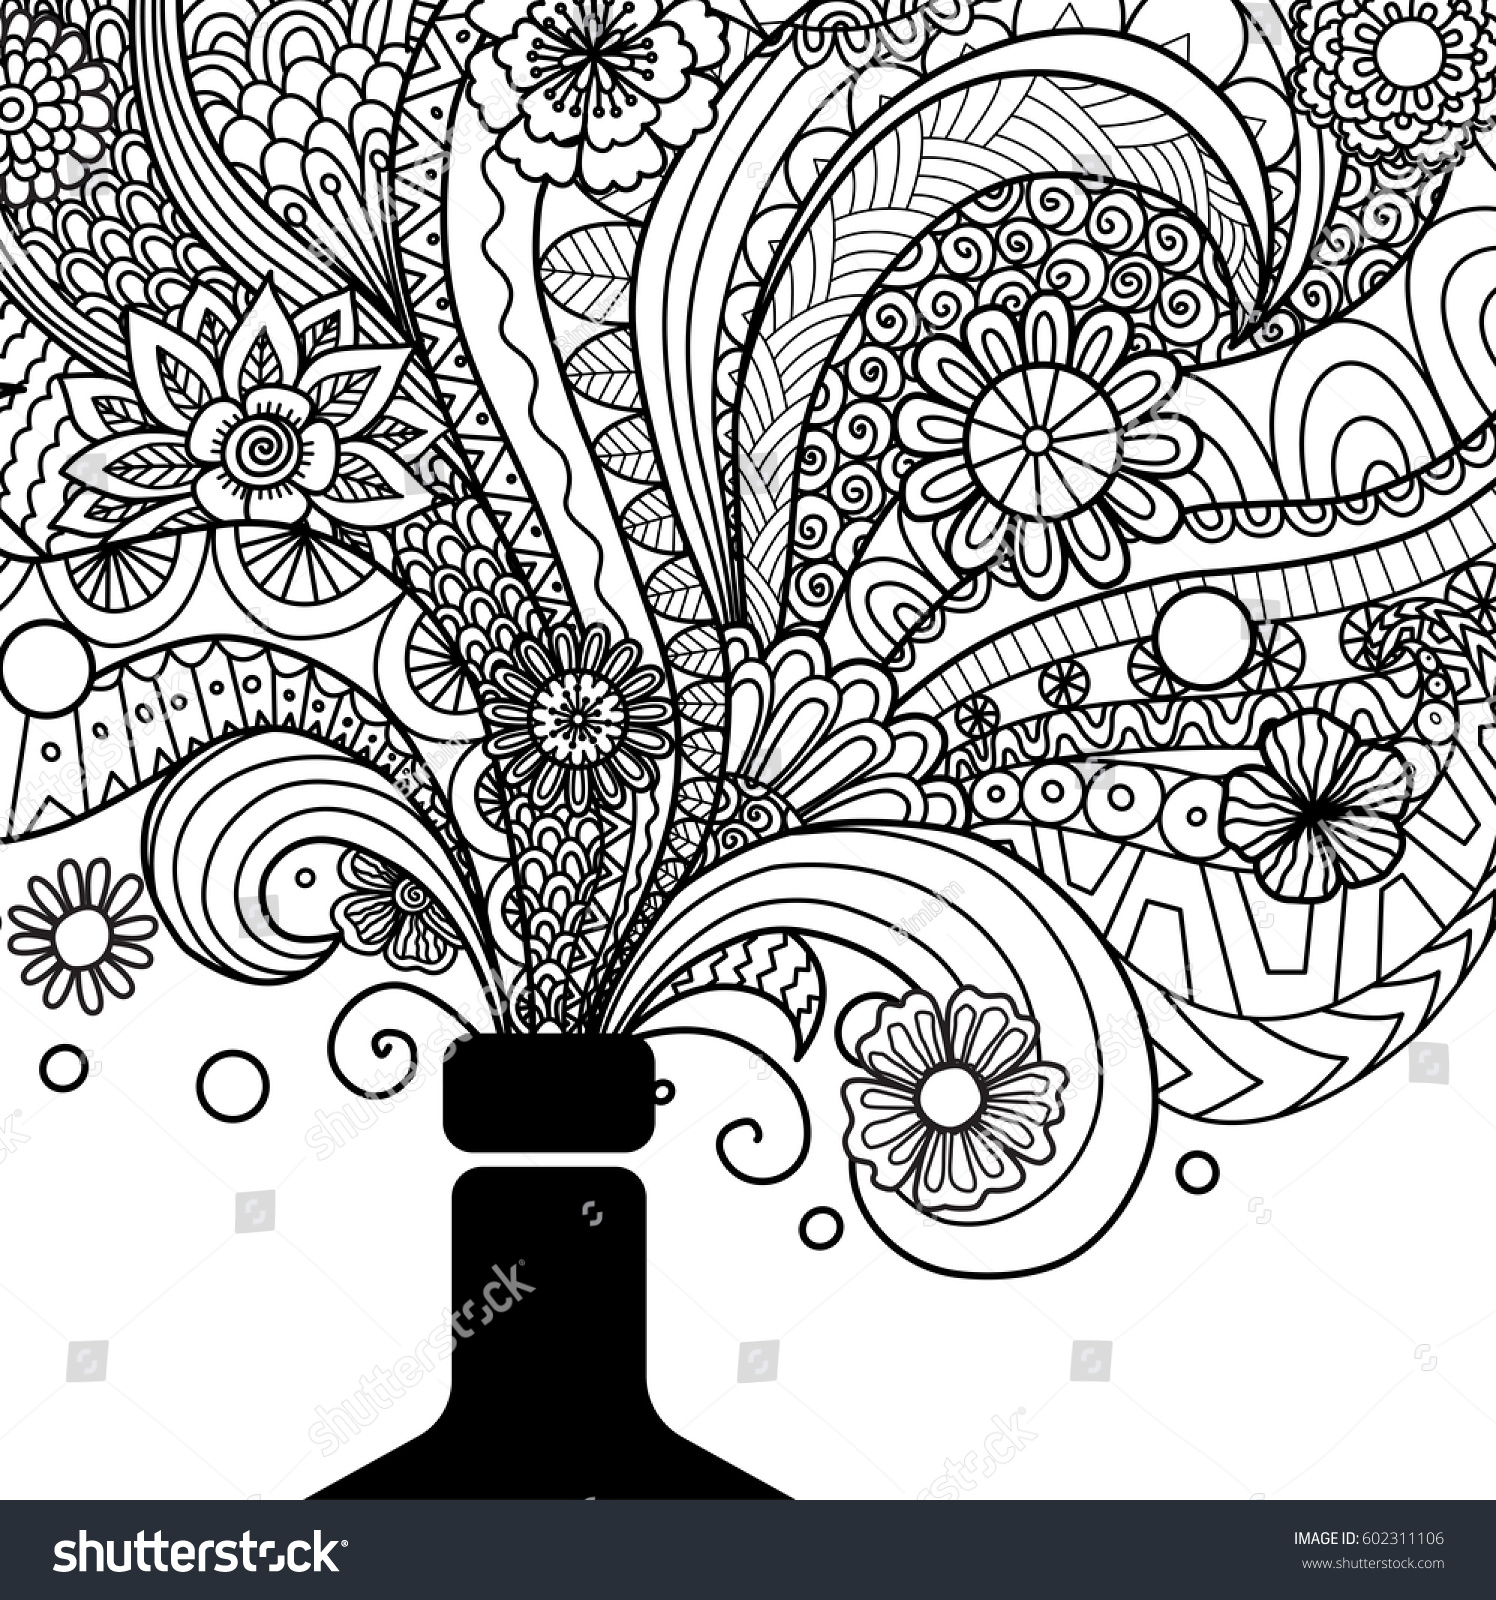 Champagne Bottle Line Art Design Coloring Stock Vector 602311106 ...